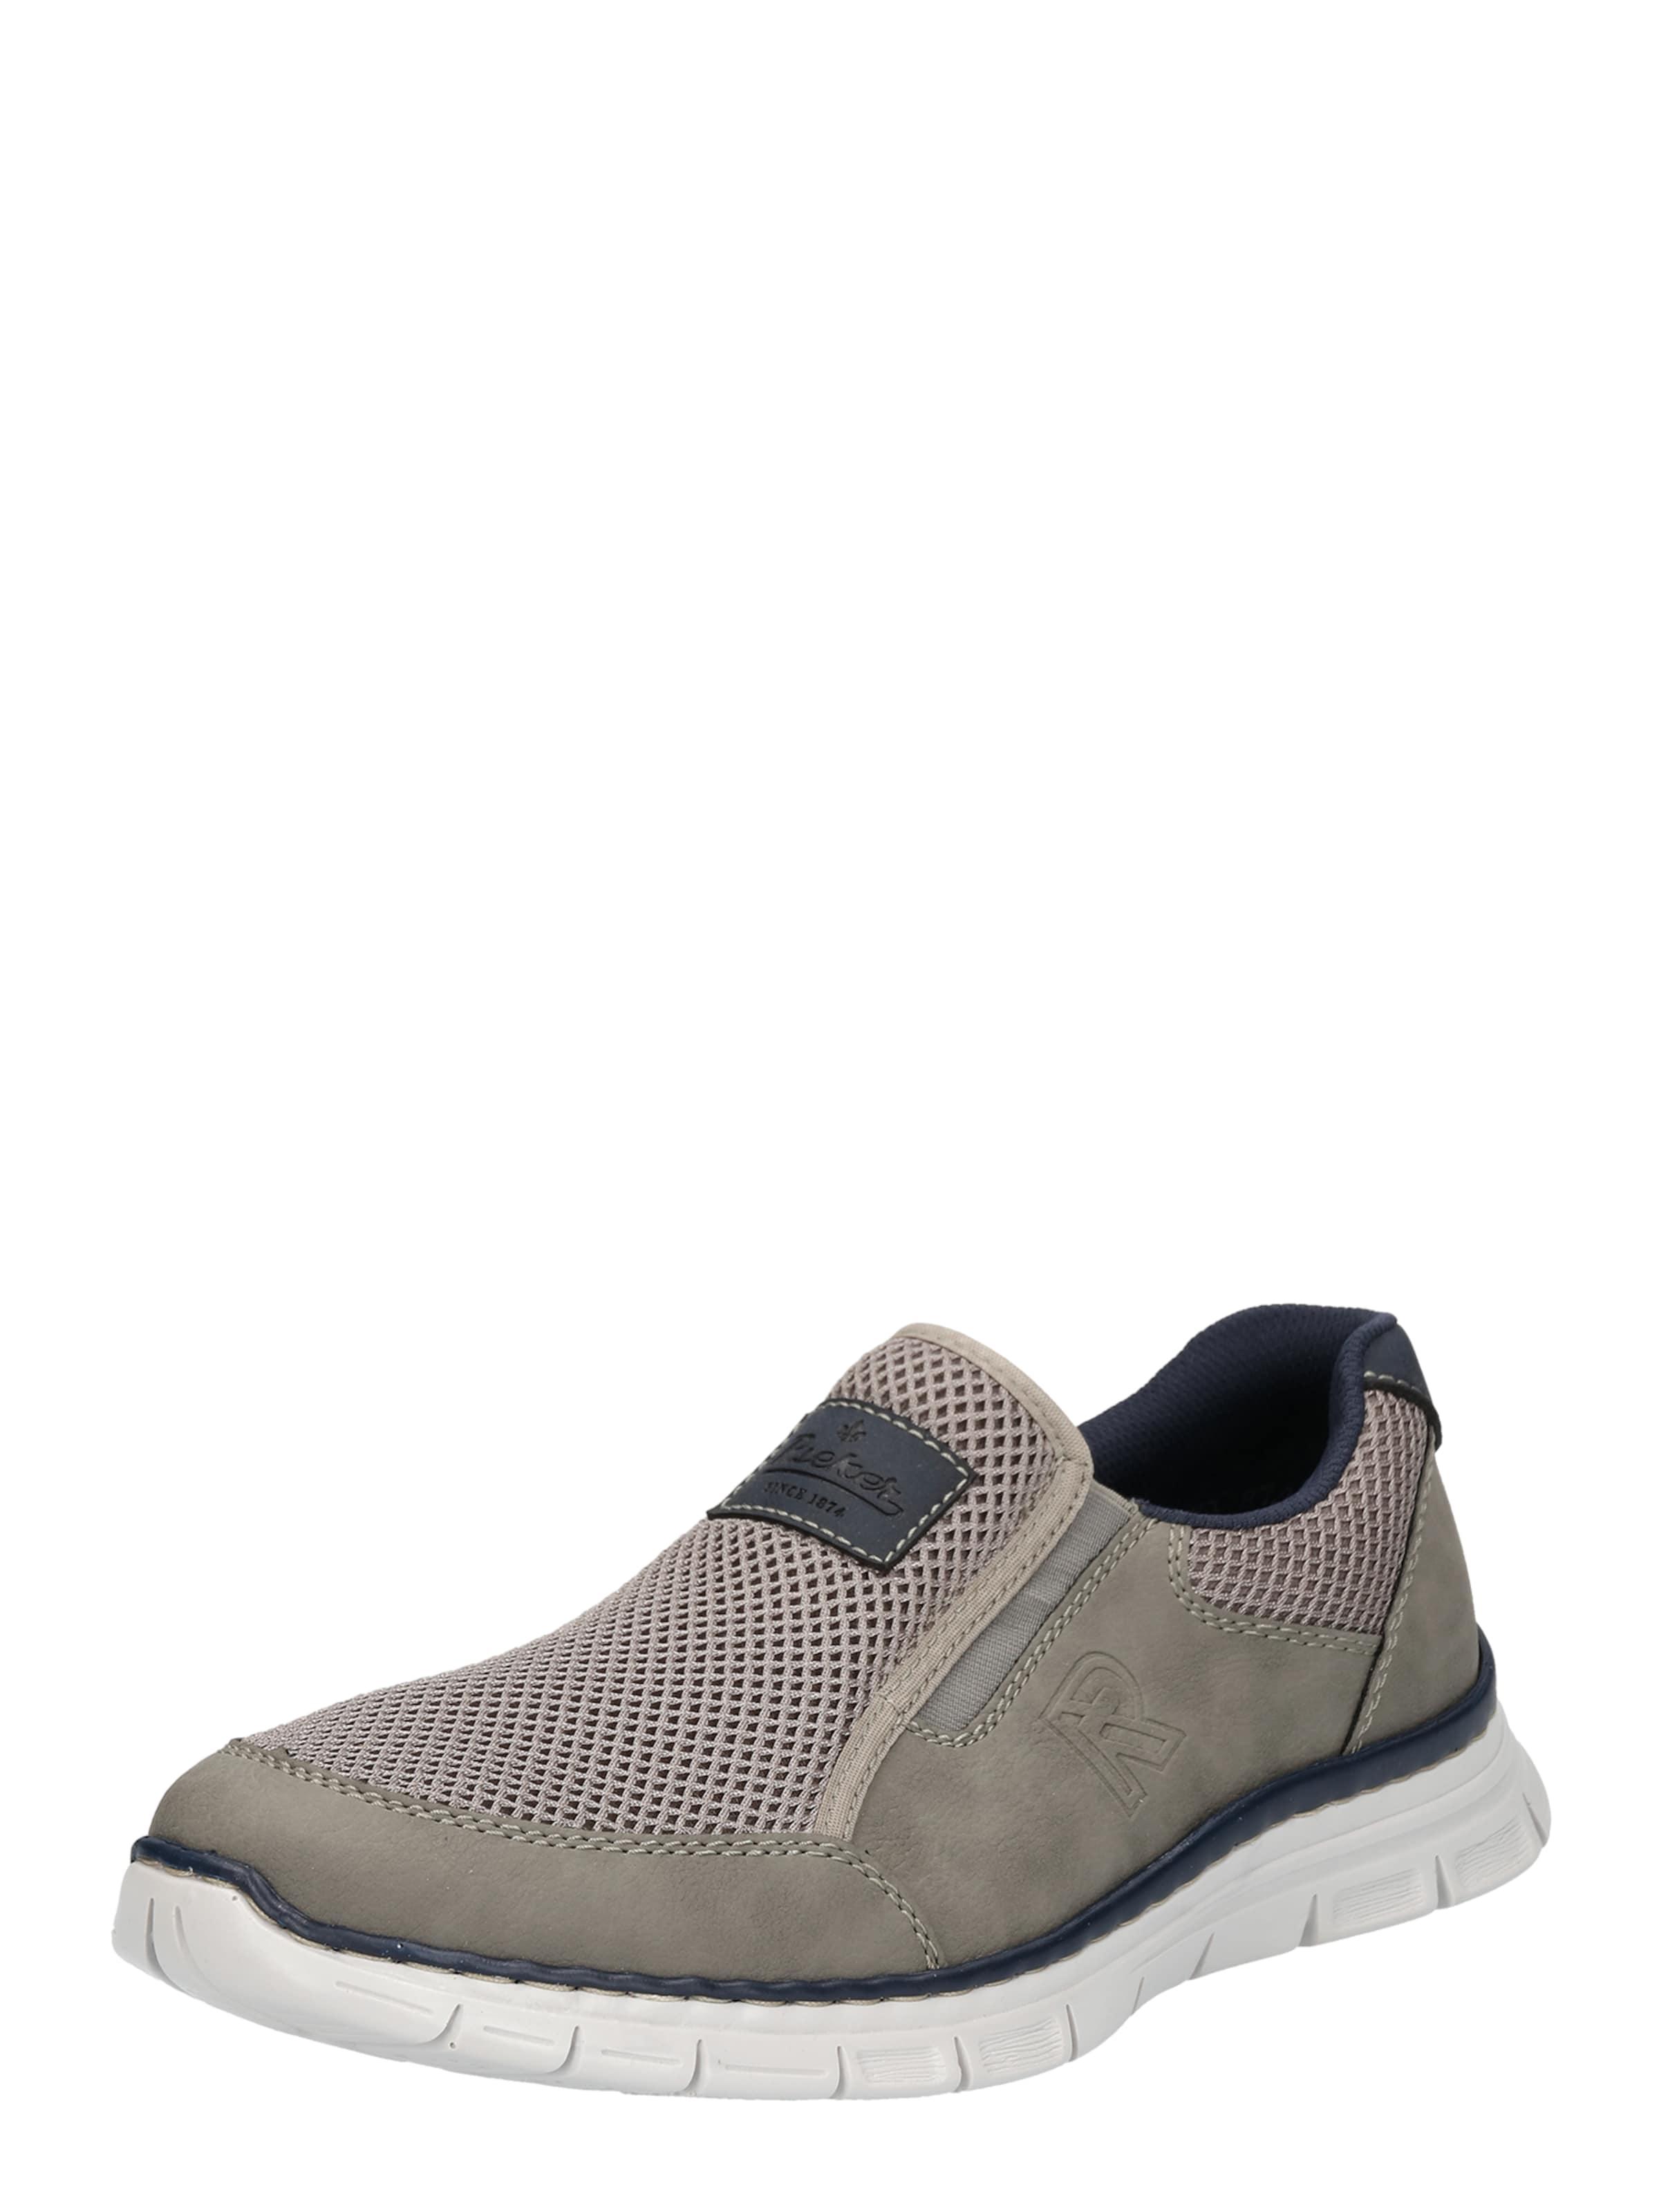 RIEKER Slip-On Sneaker Verschleißfeste billige Schuhe